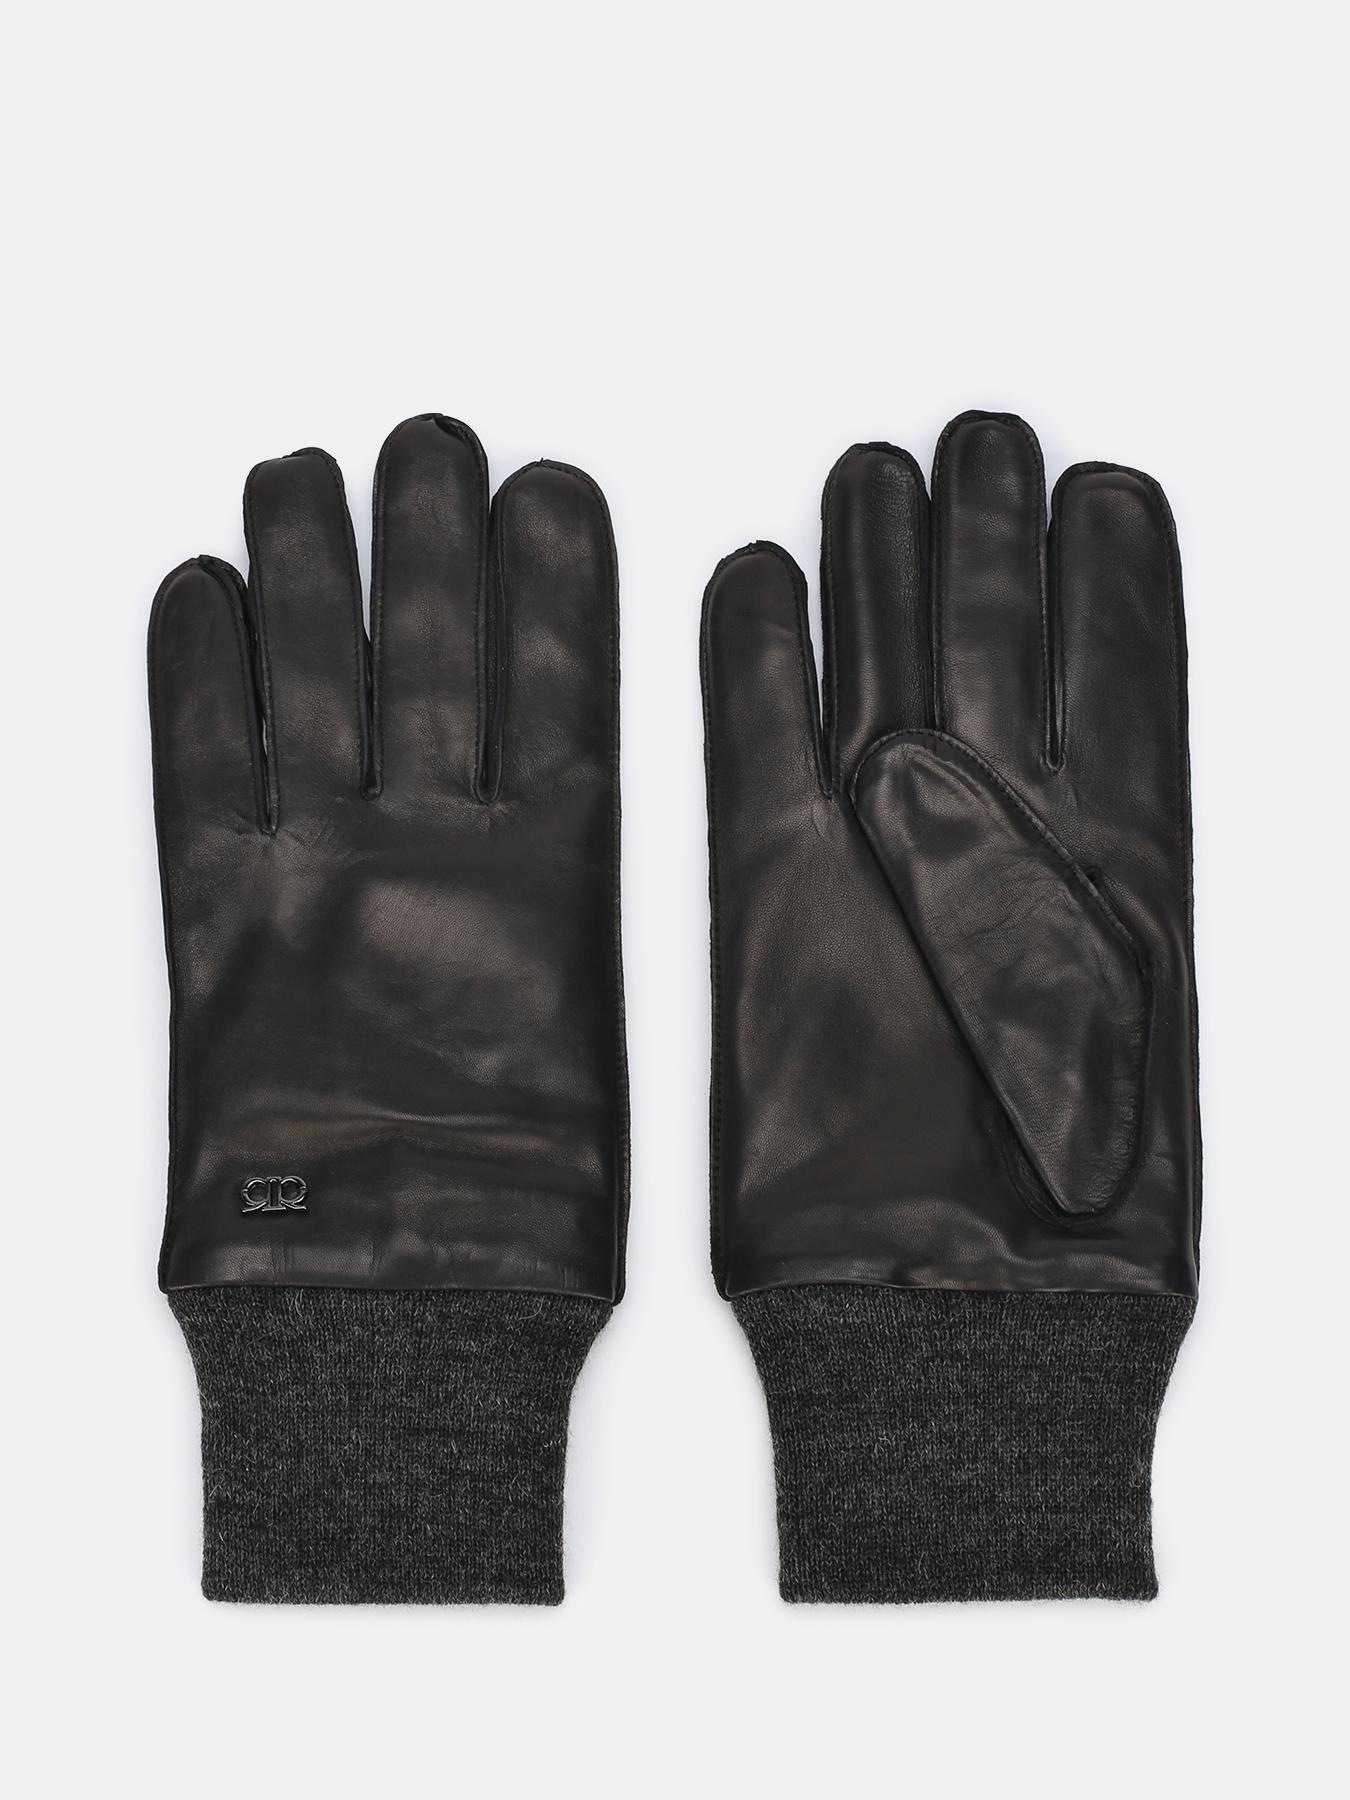 Кожаные перчатки Ritter Кожаные перчатки